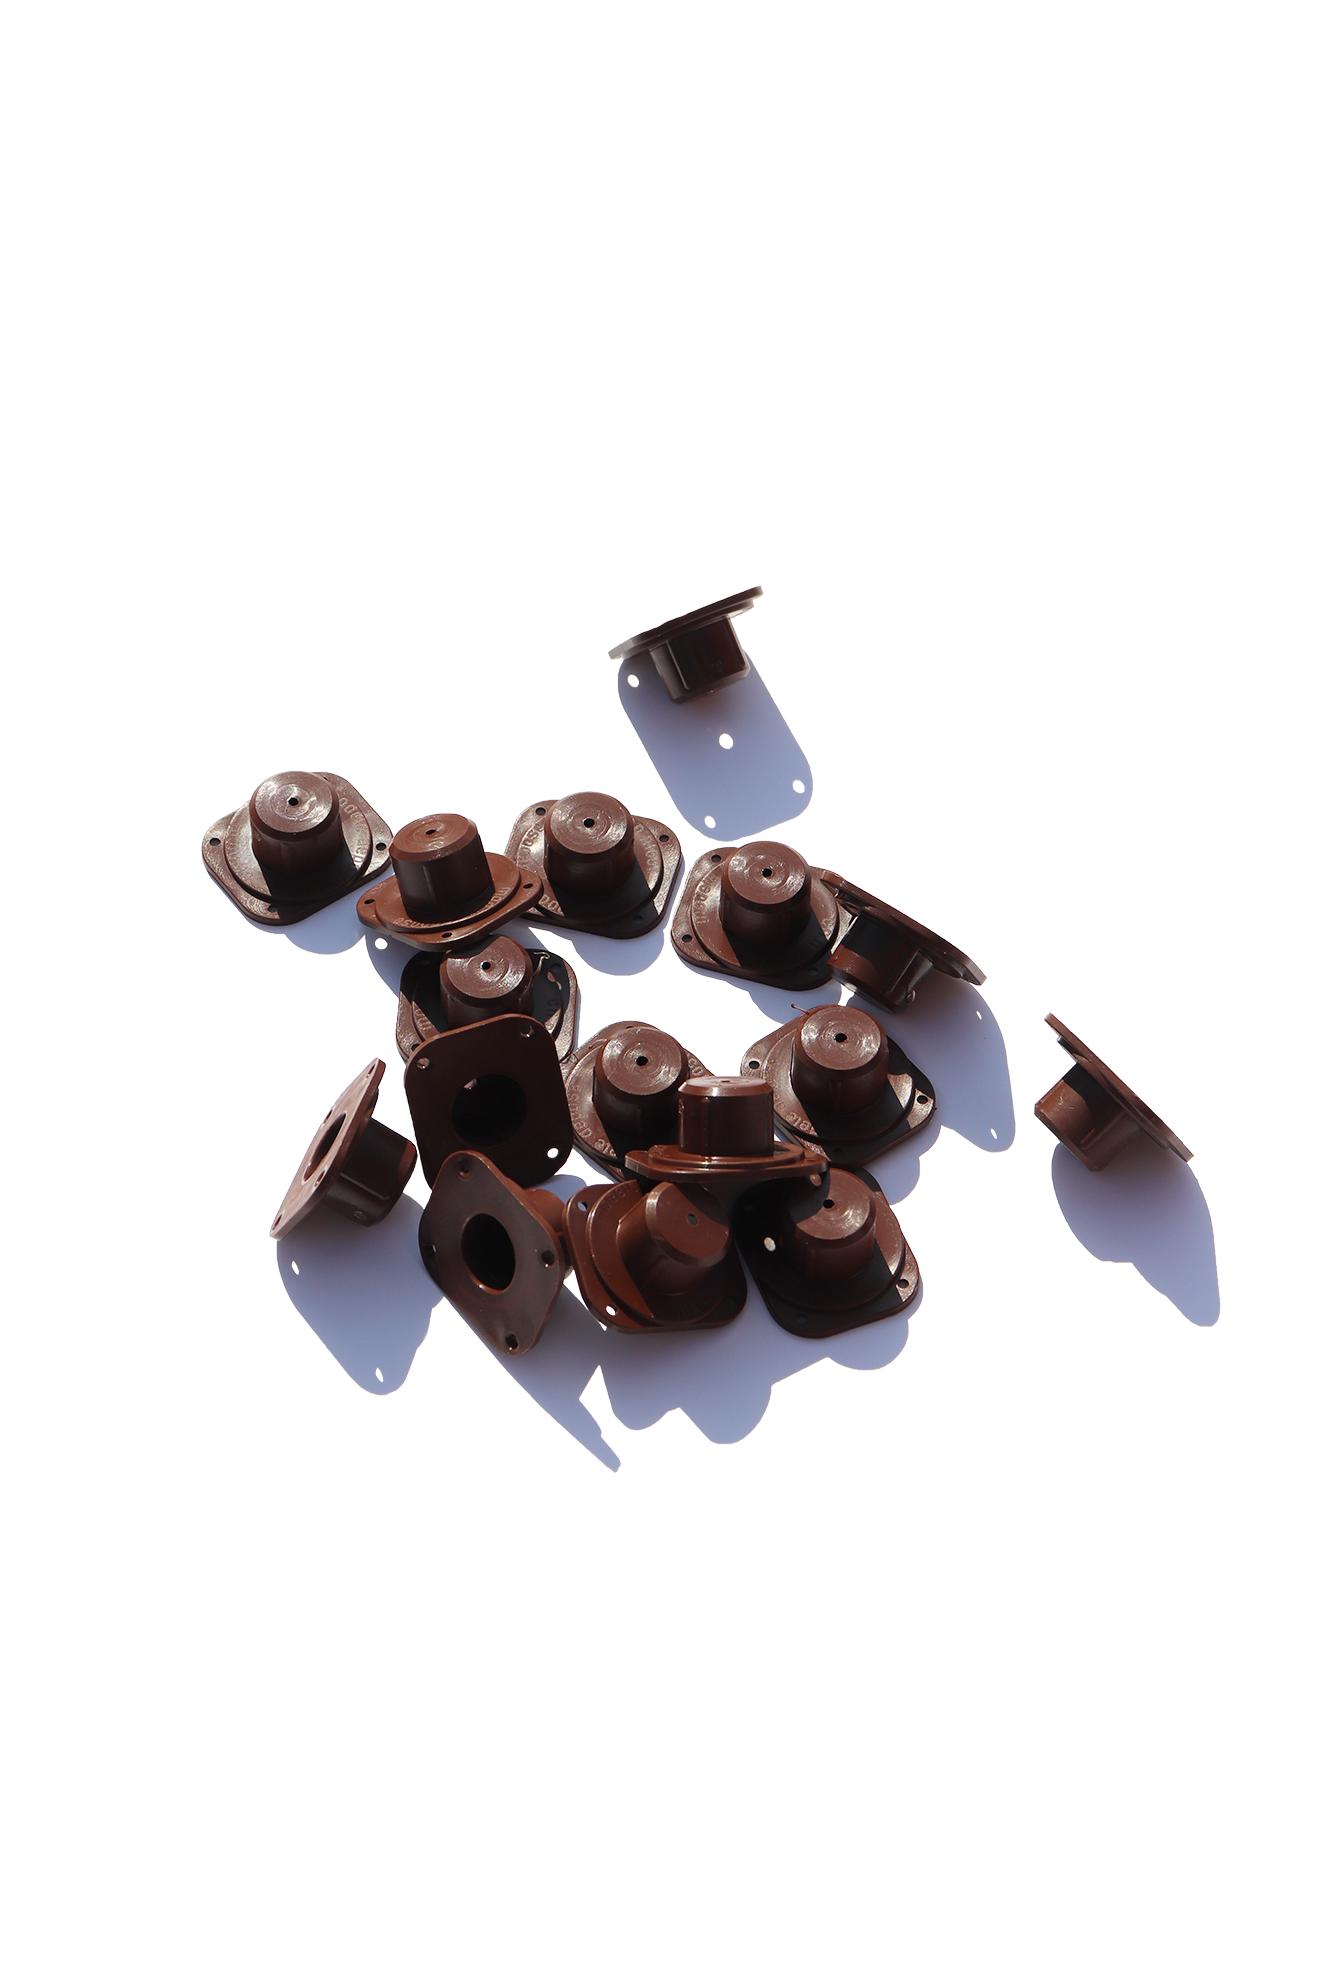 Bruine nicot bevestiger (100 stuks)-1